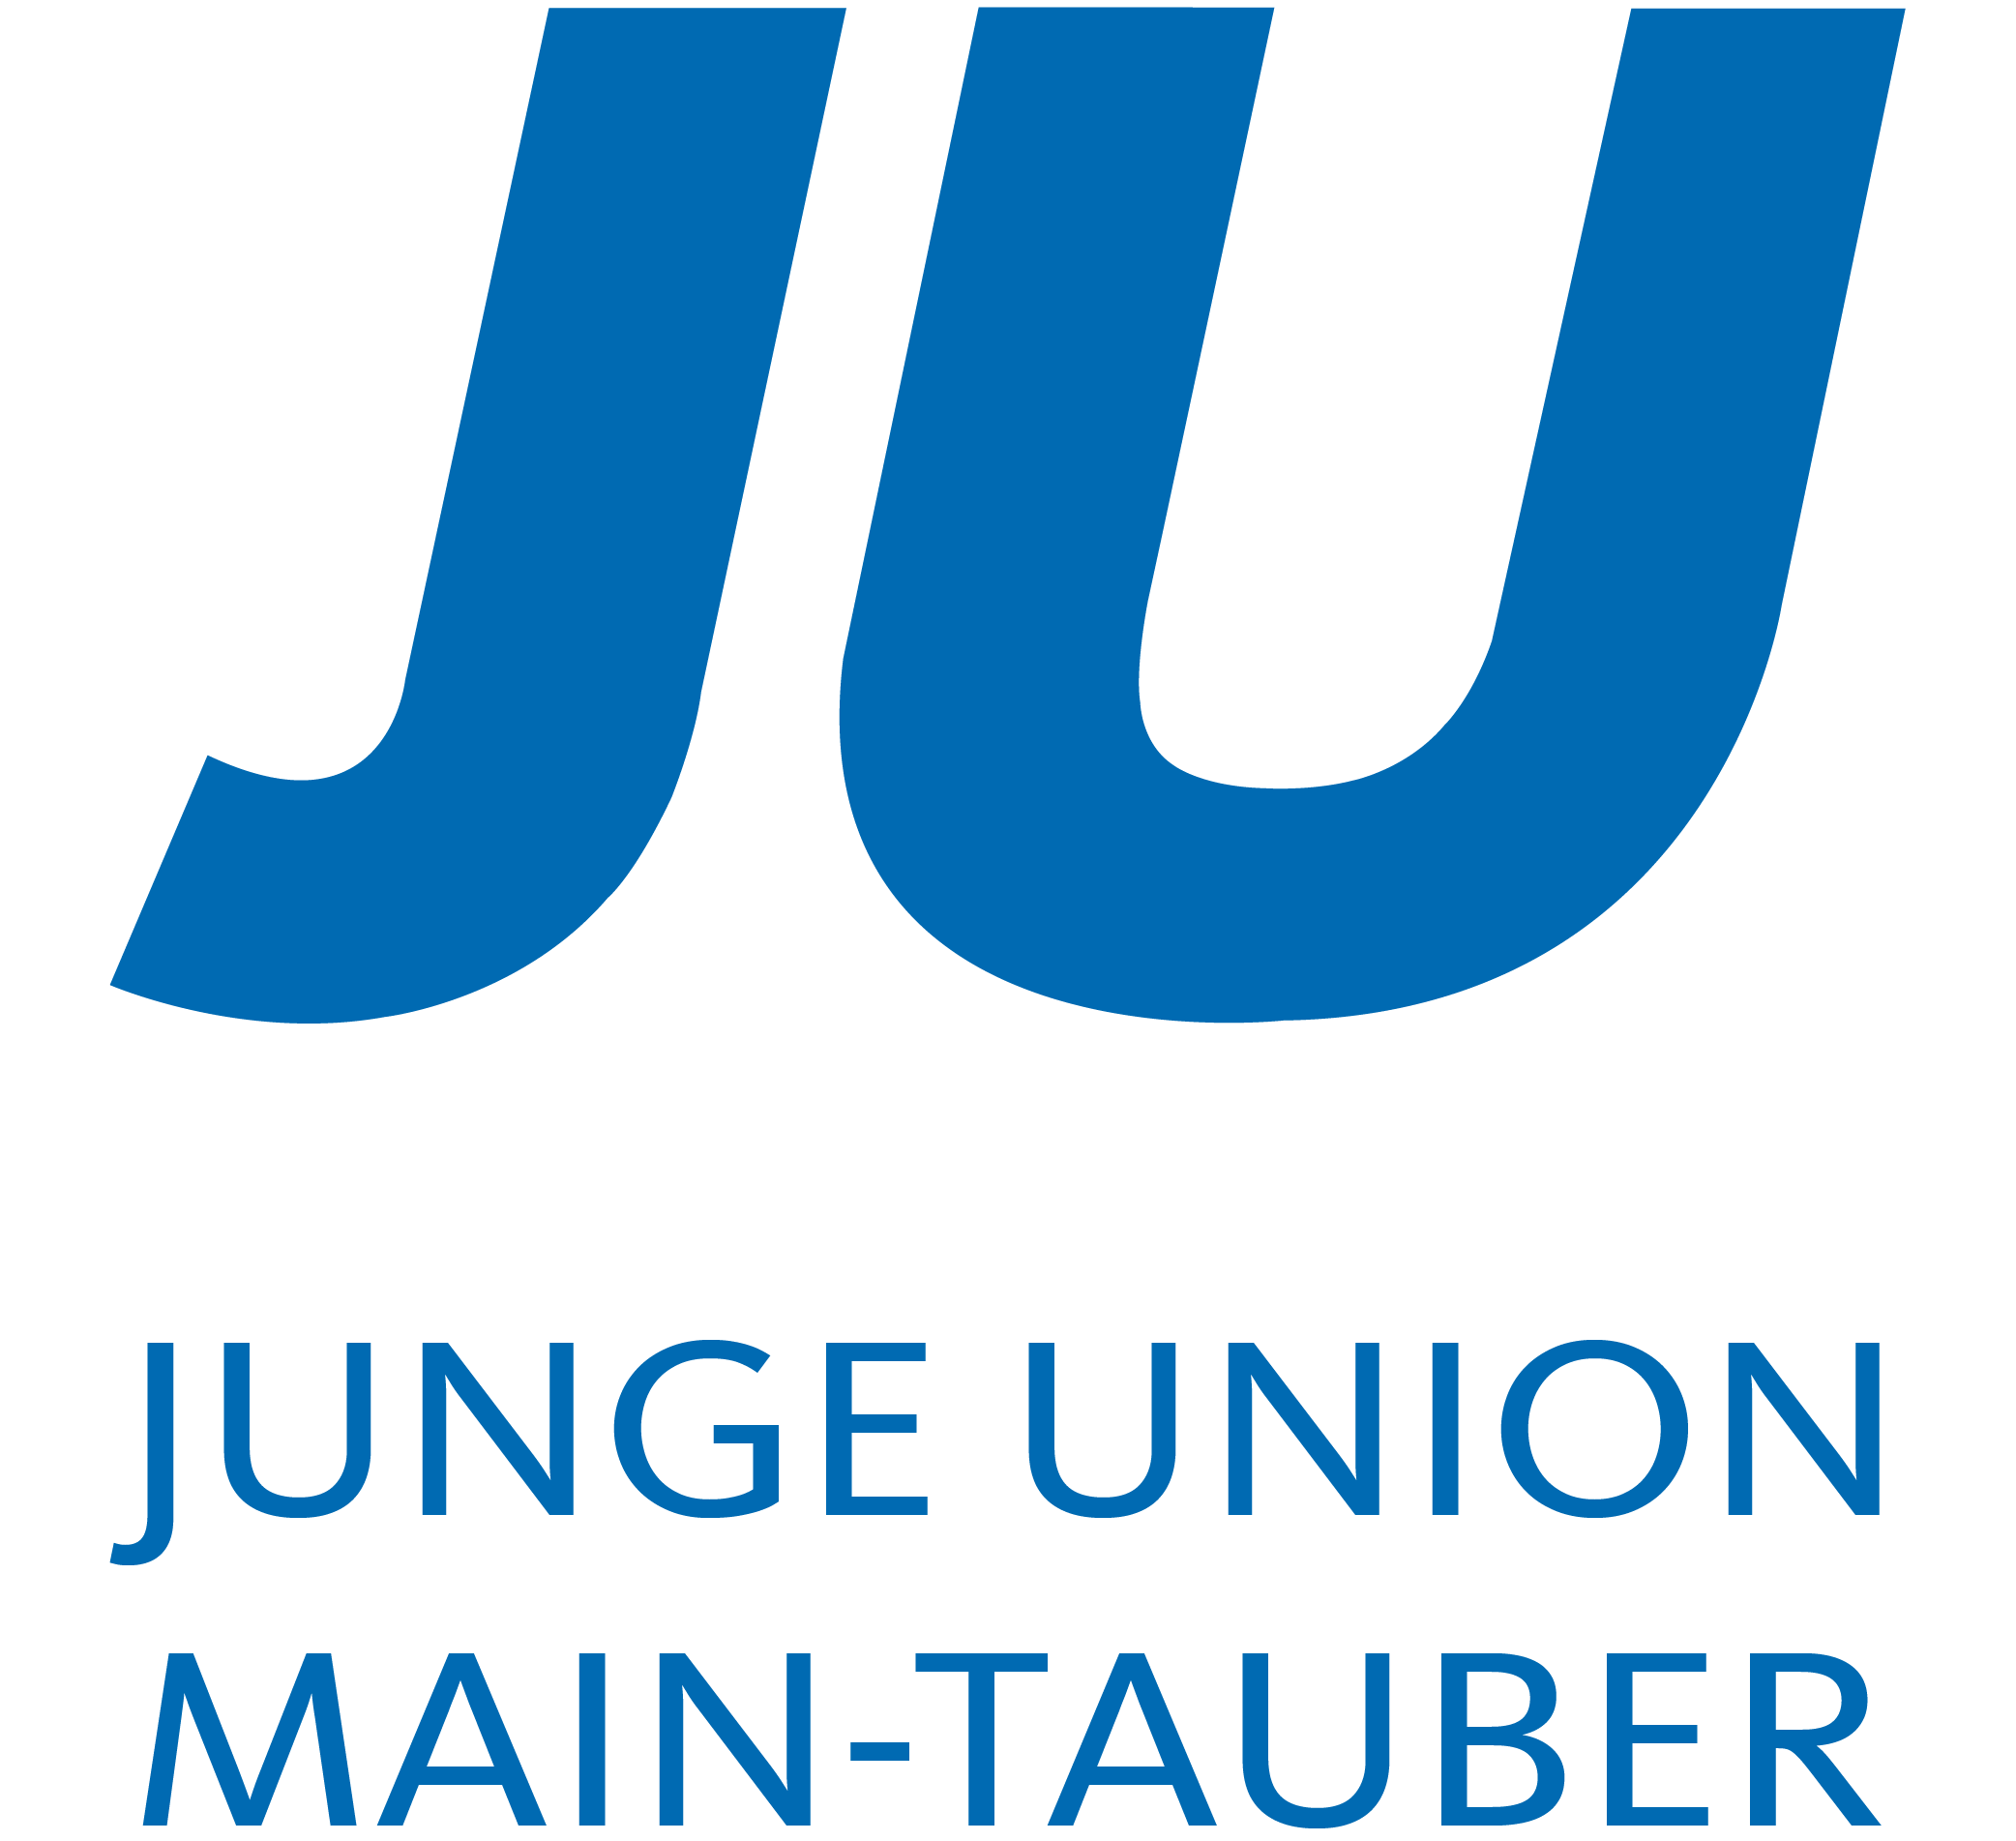 Junge Union Main-Tauber